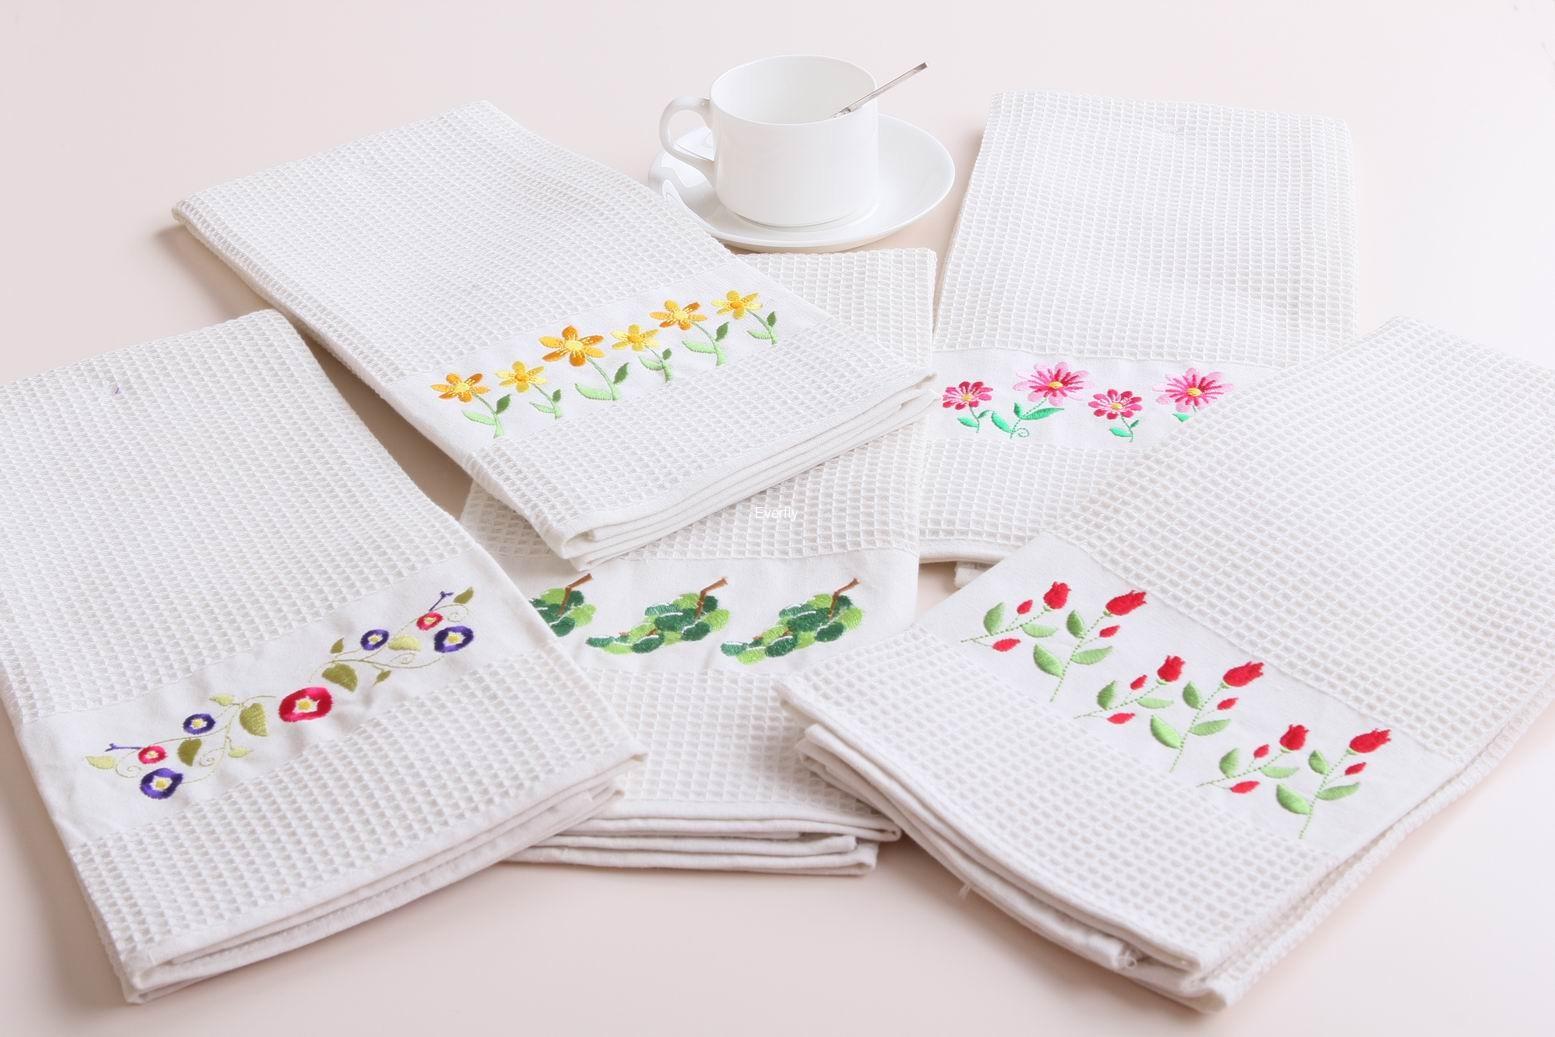 Kitchen Towel Embroidery Patterns Kitchen Towel Cotton Kitchen Towel Kitchen Tea Towelcotton Waffle